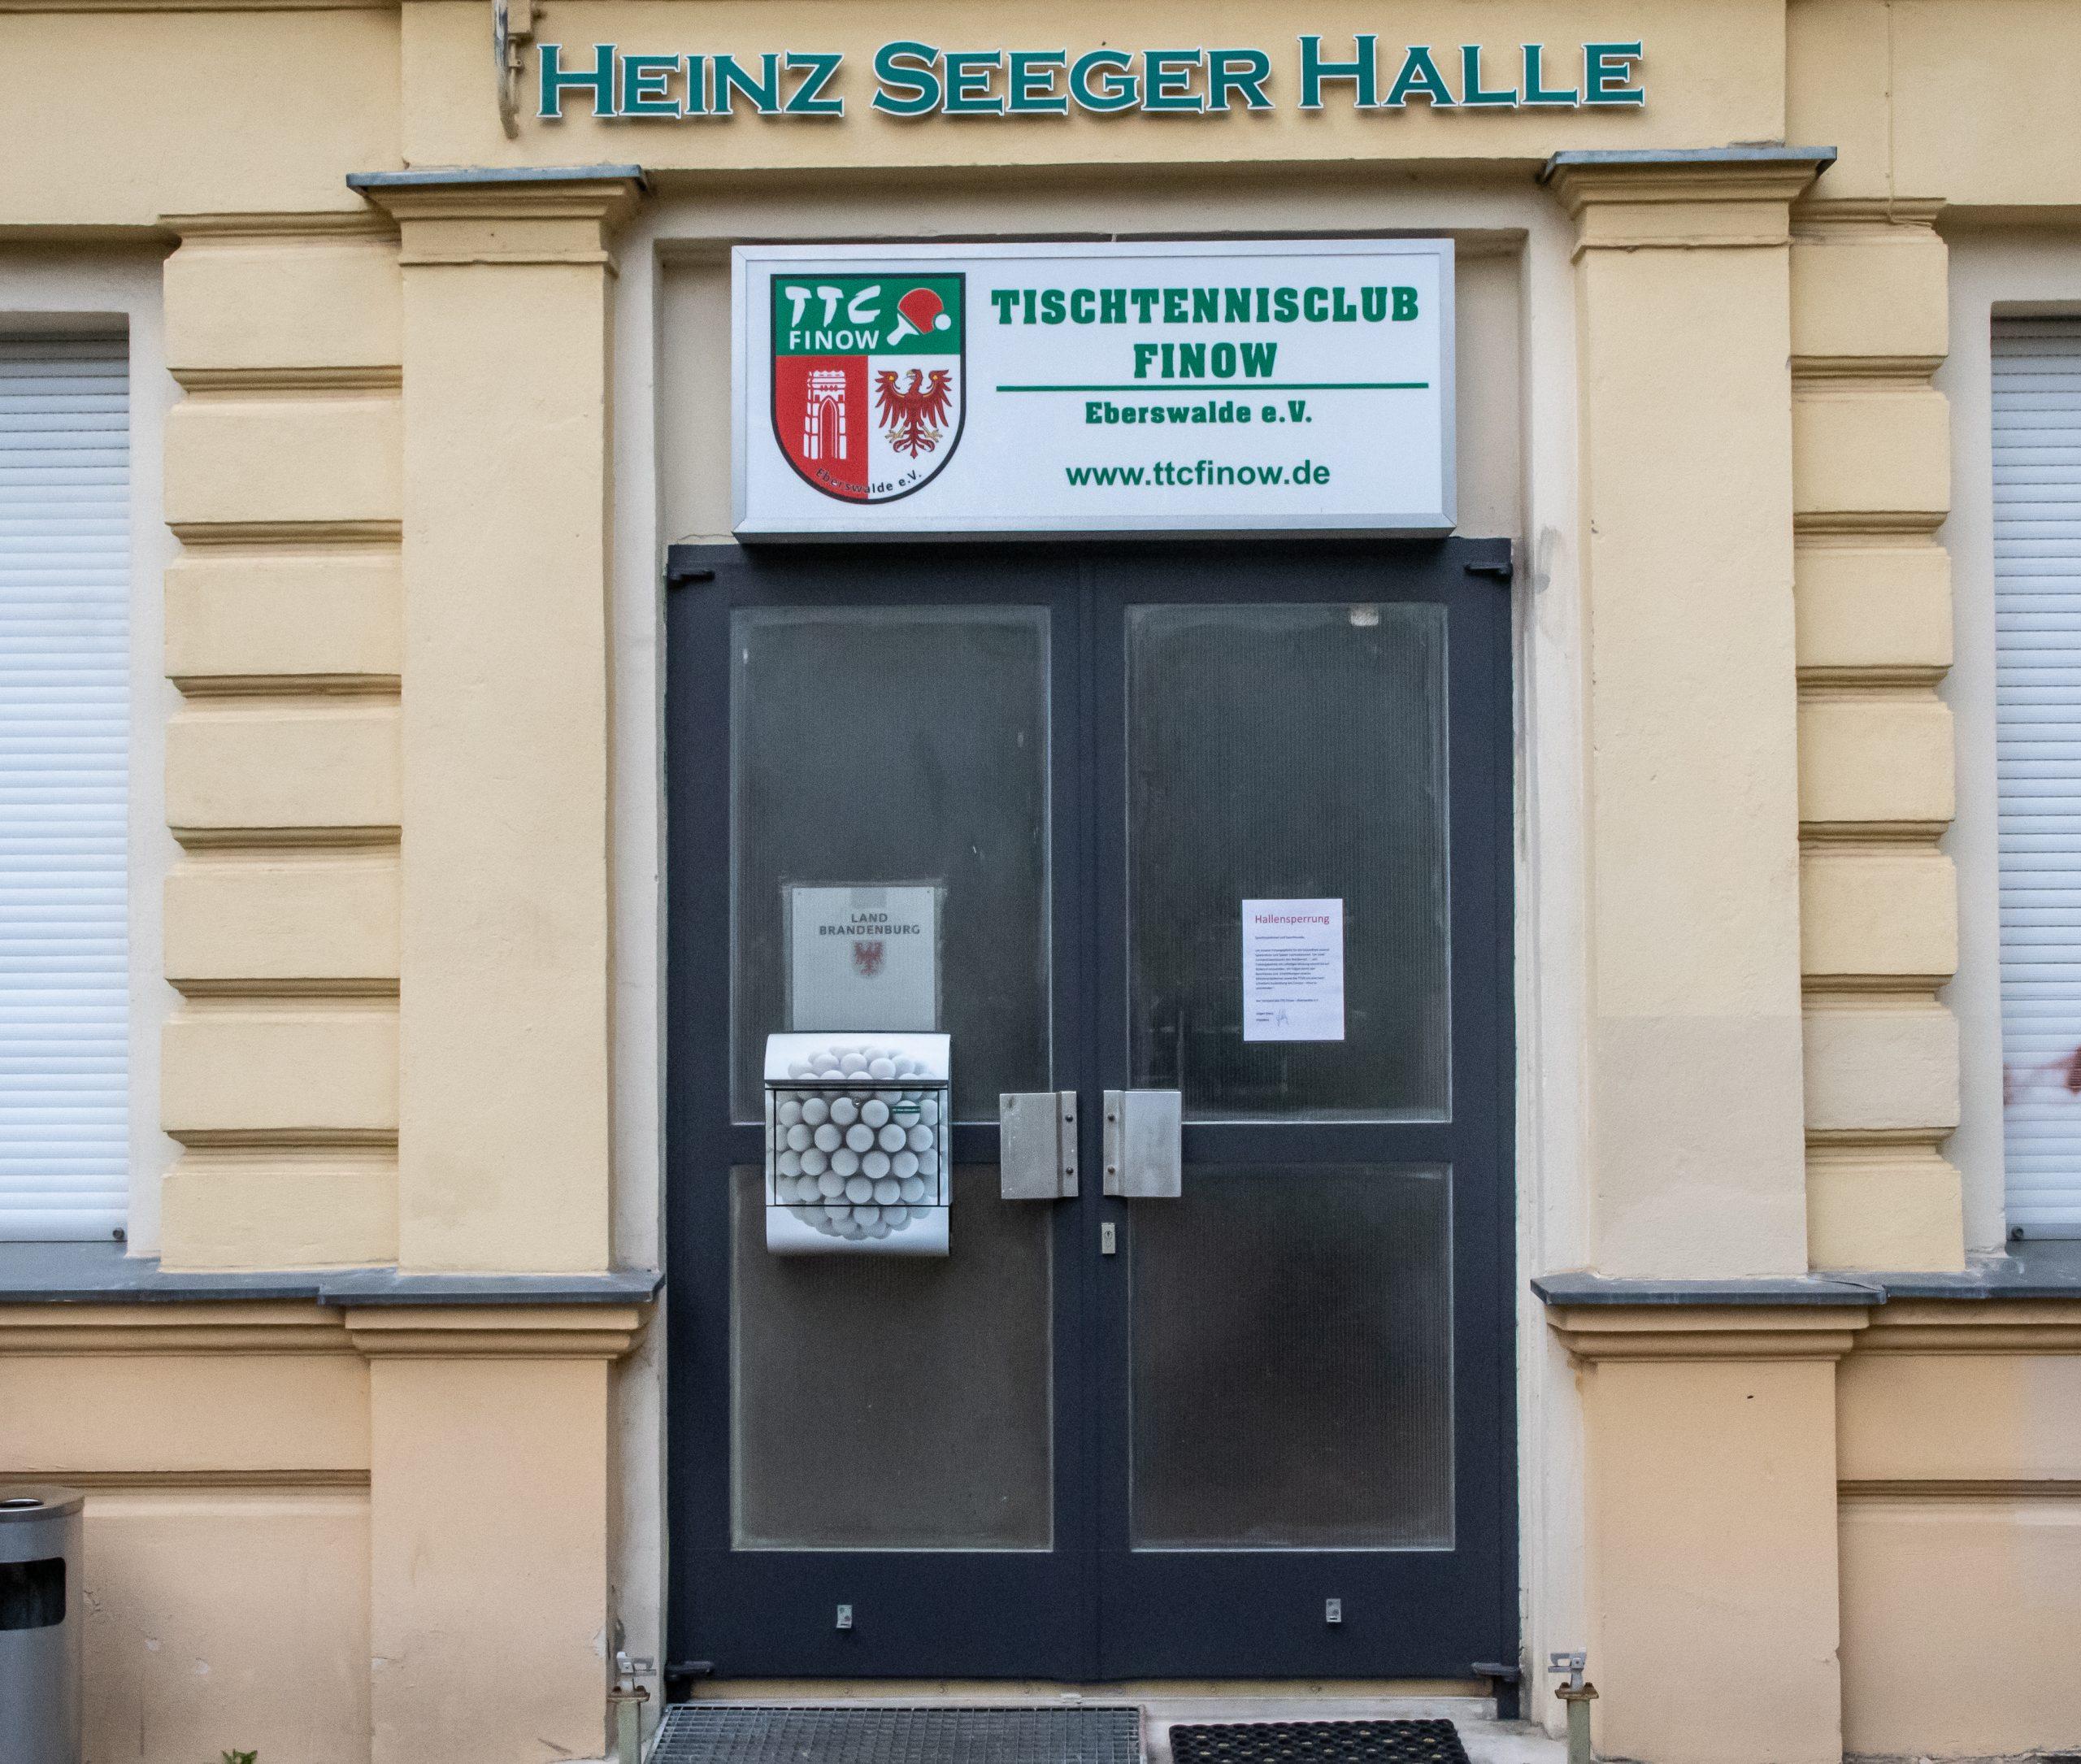 Heinz-Seeger-Halle